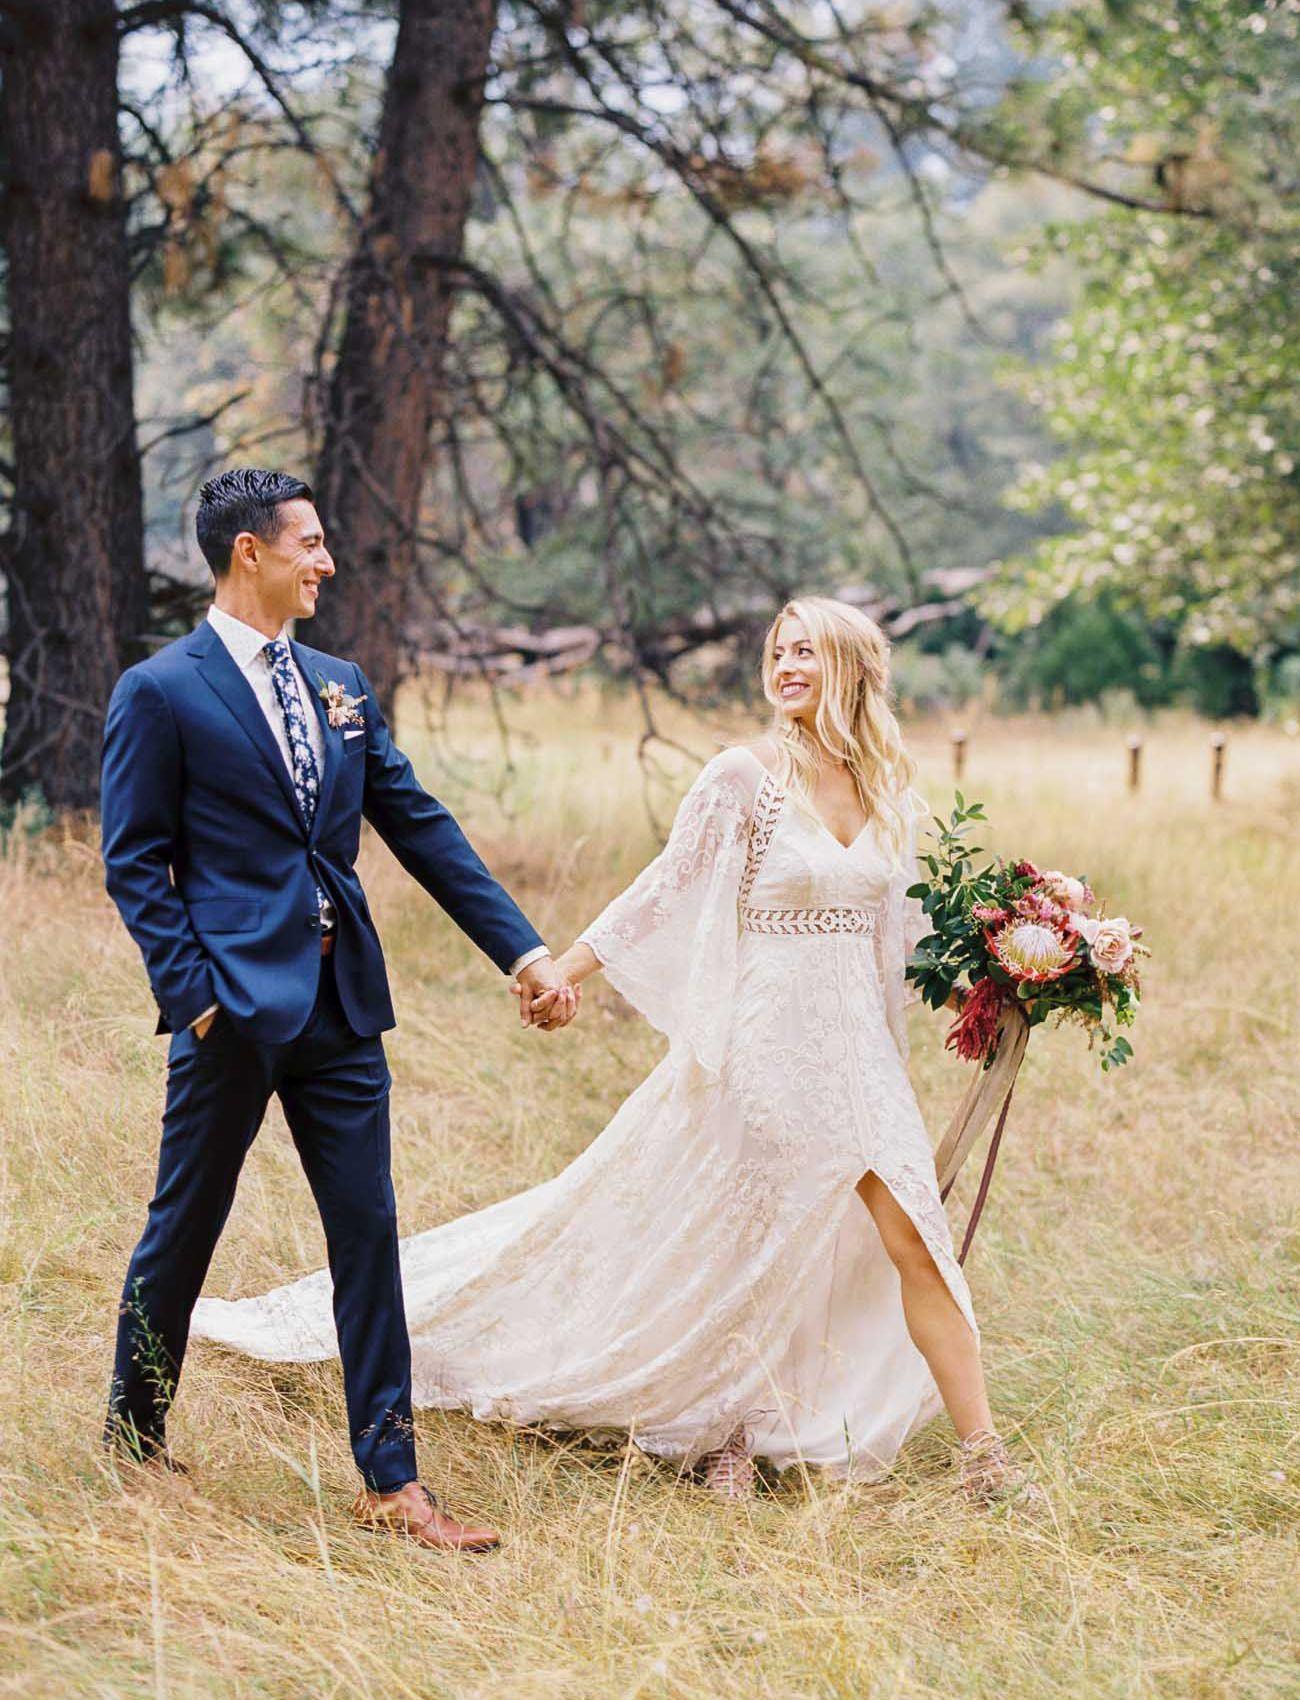 Nature inspired boho wedding in yosemite national park wedding